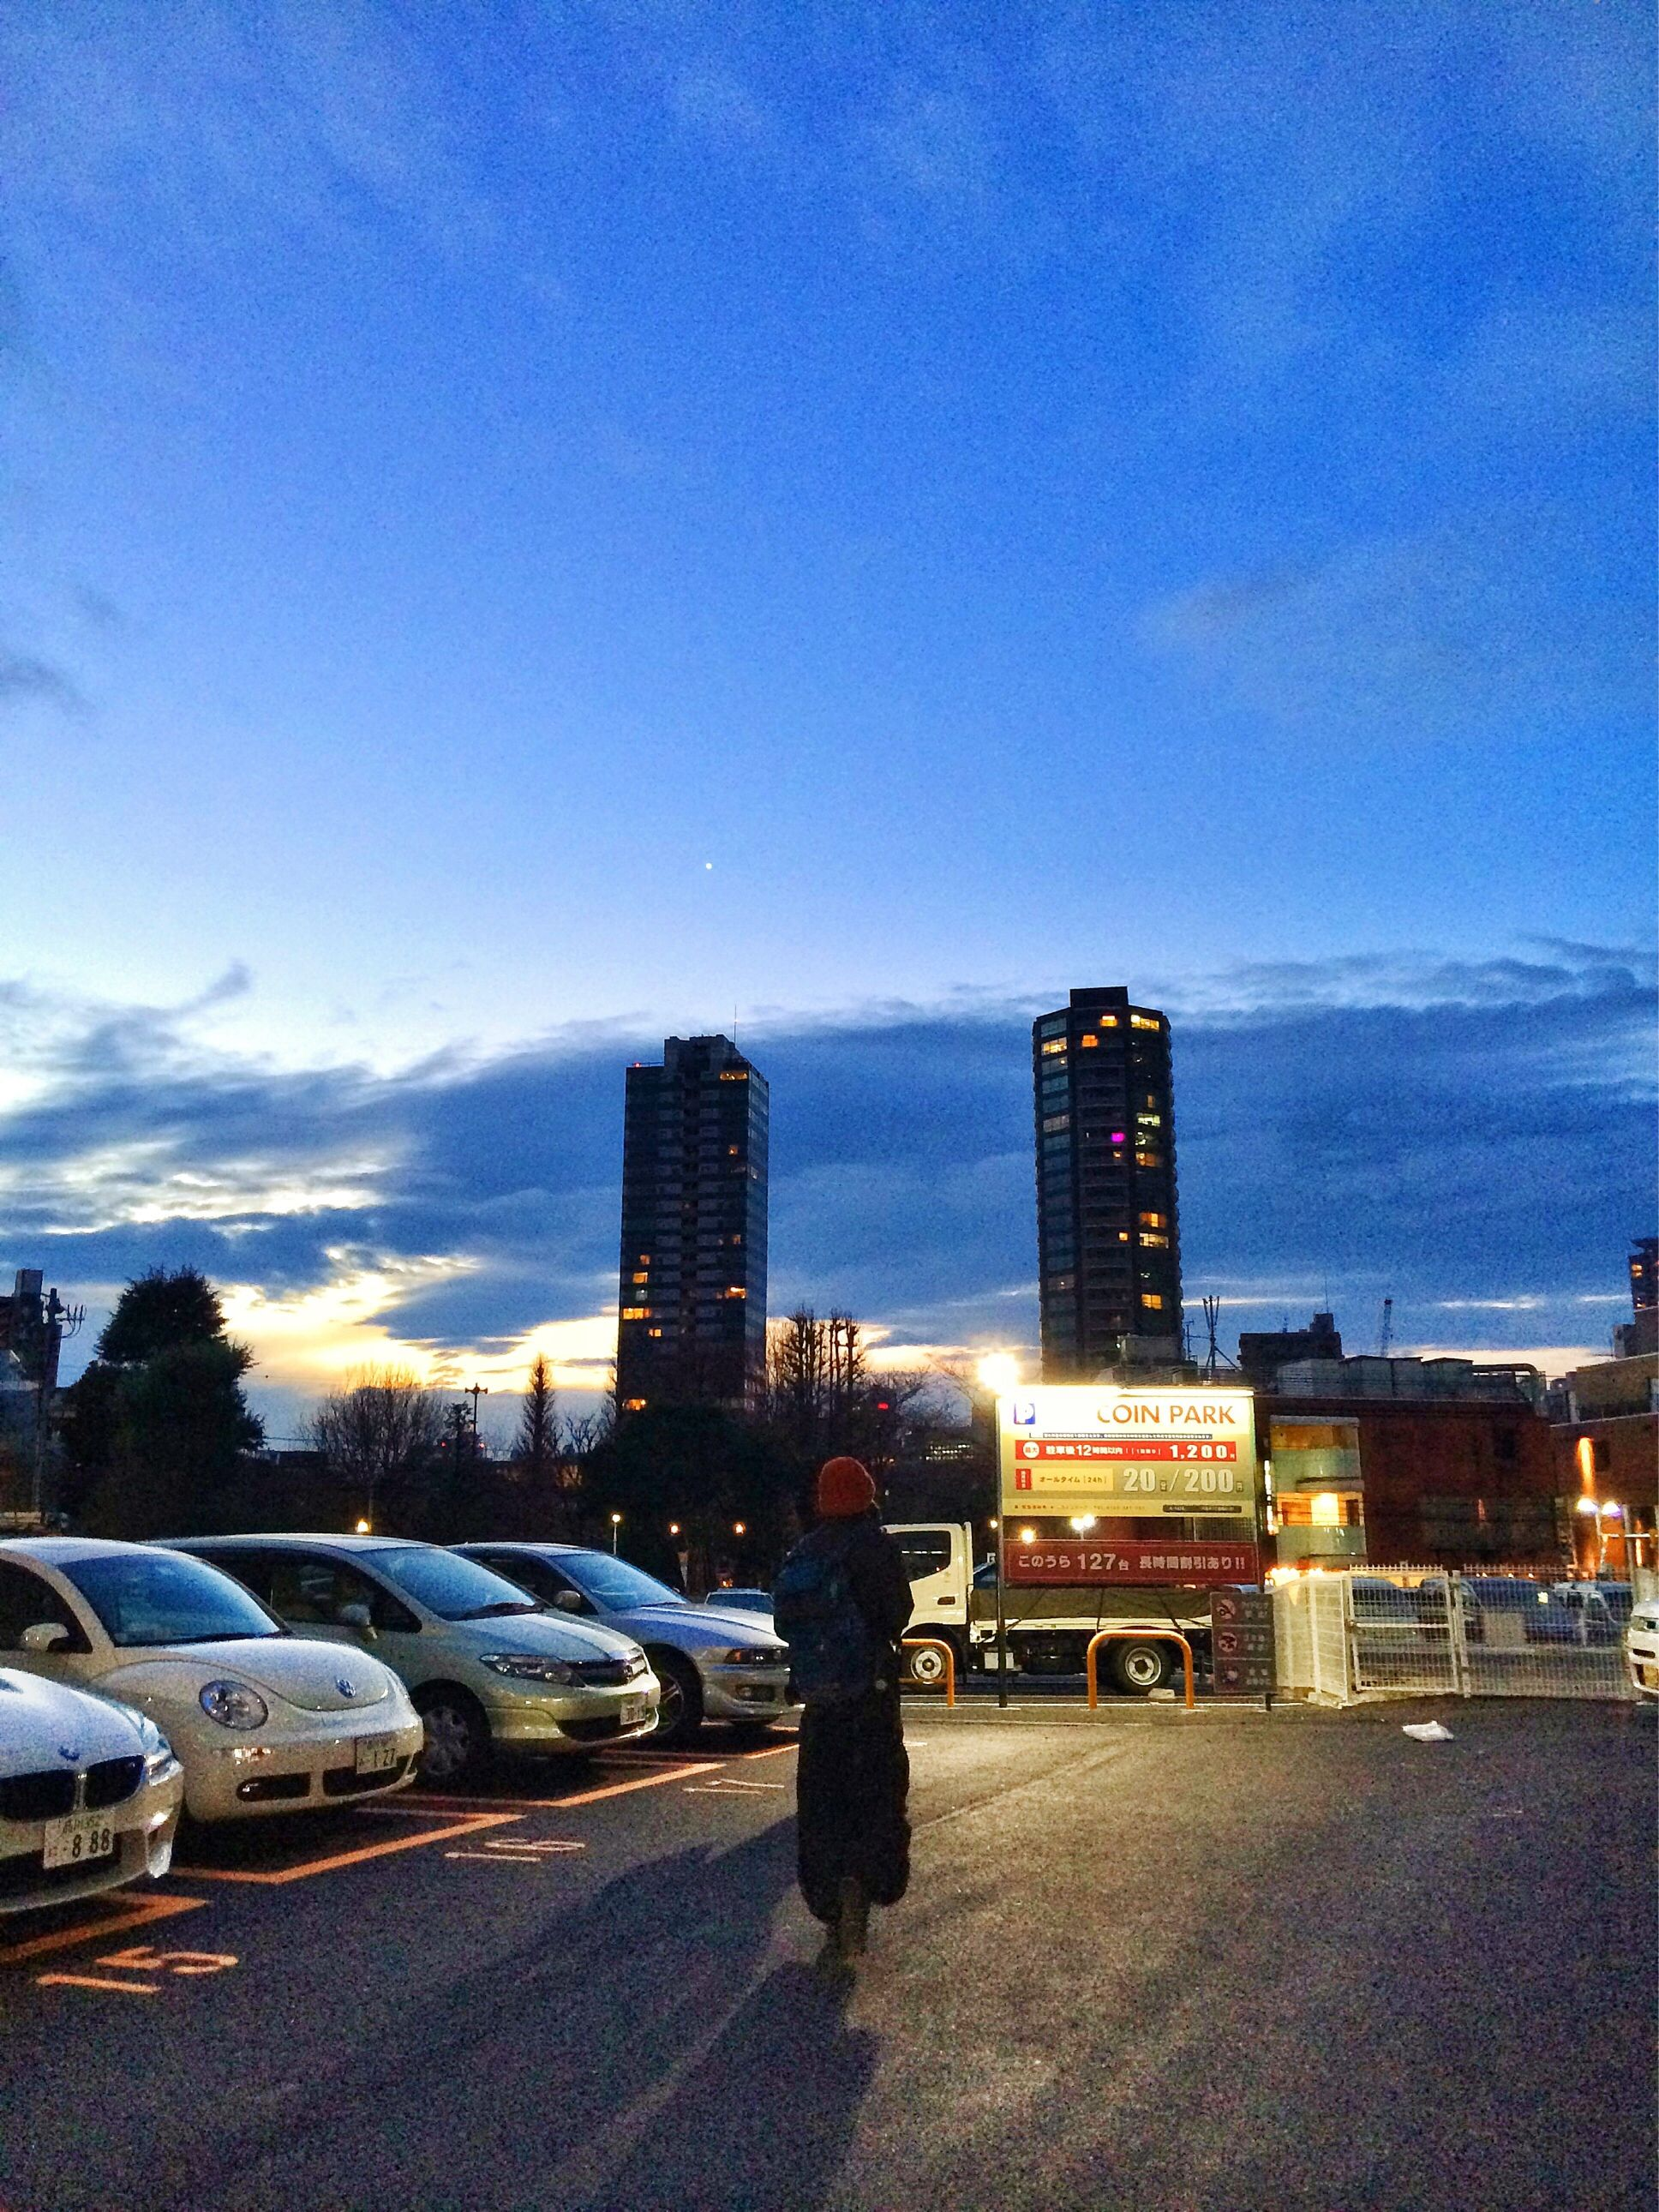 #Roppongi #Tokyo #Japan 六本木の夕暮れ、影が長い。